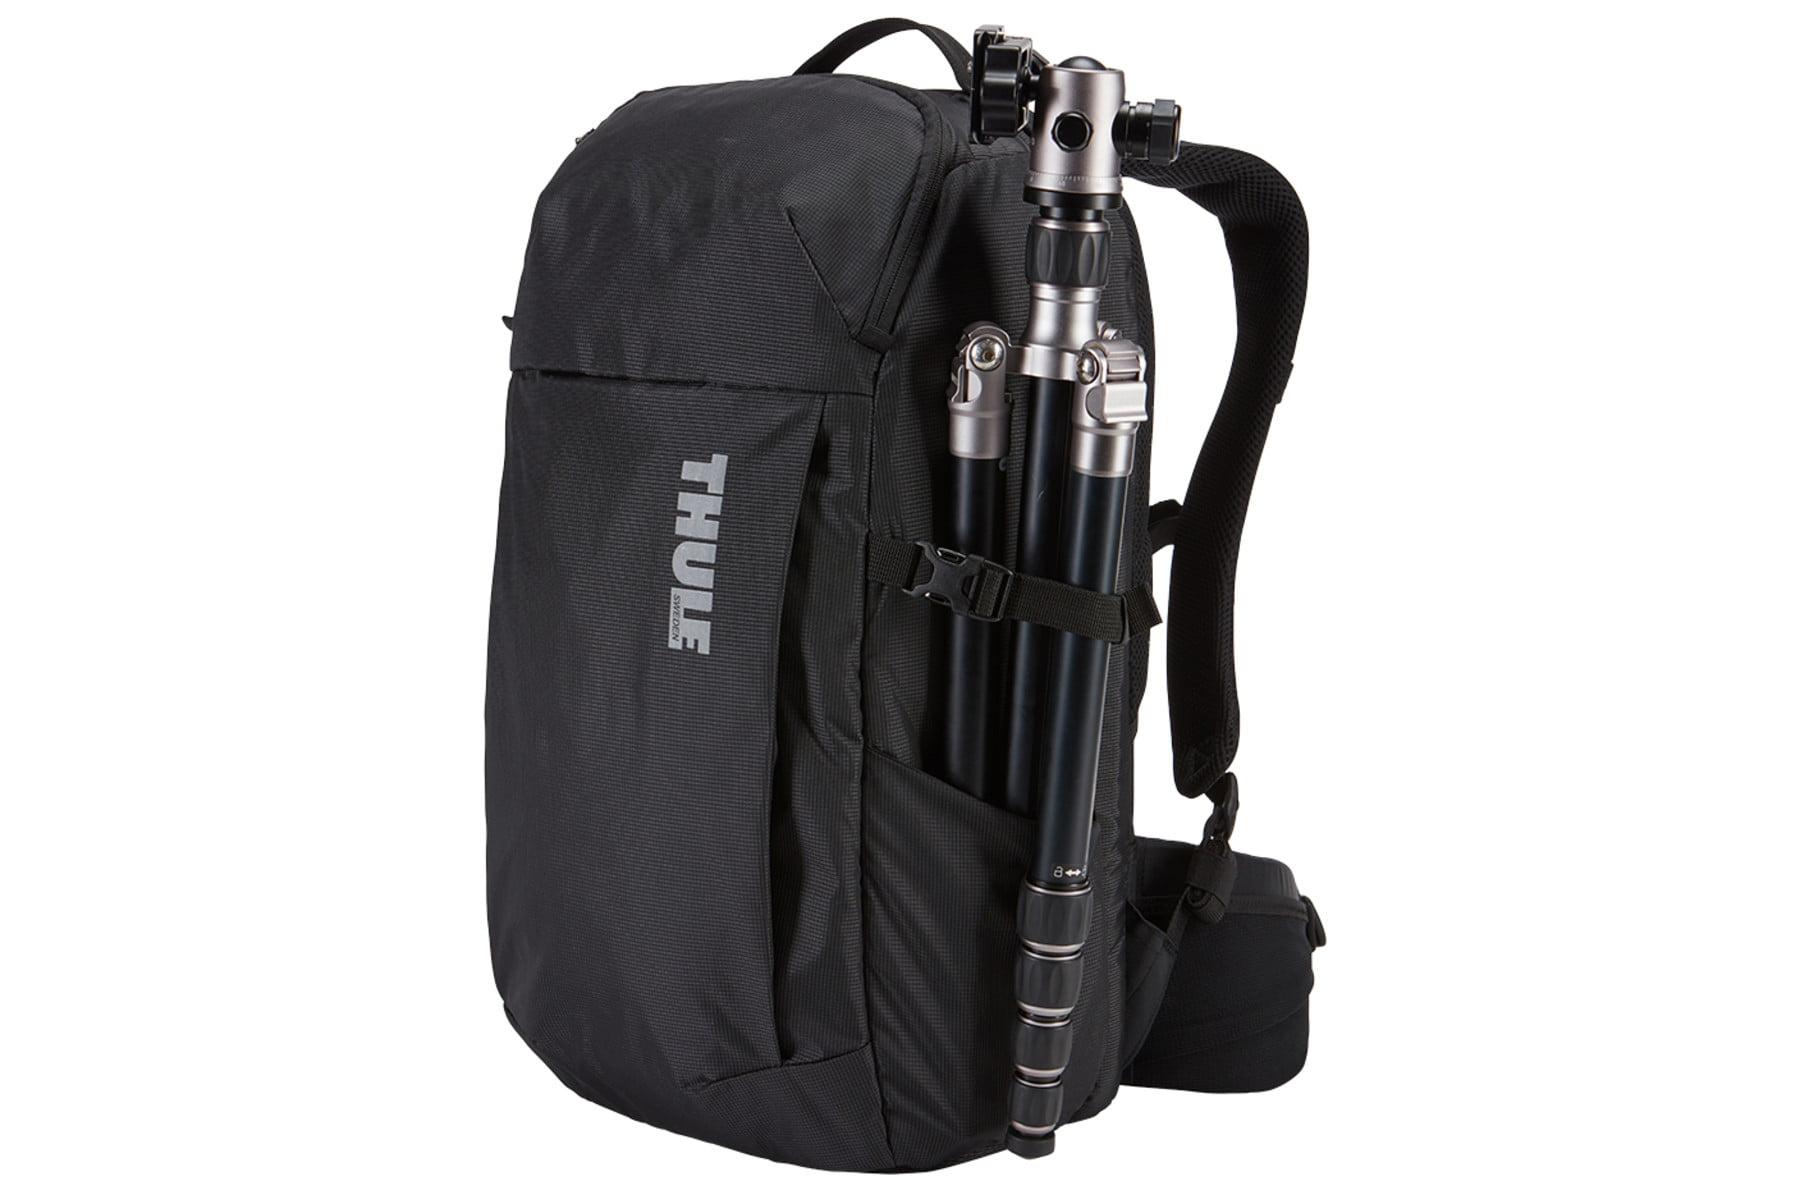 Rucsac foto Thule Aspect DSLR Backpack Negru 7